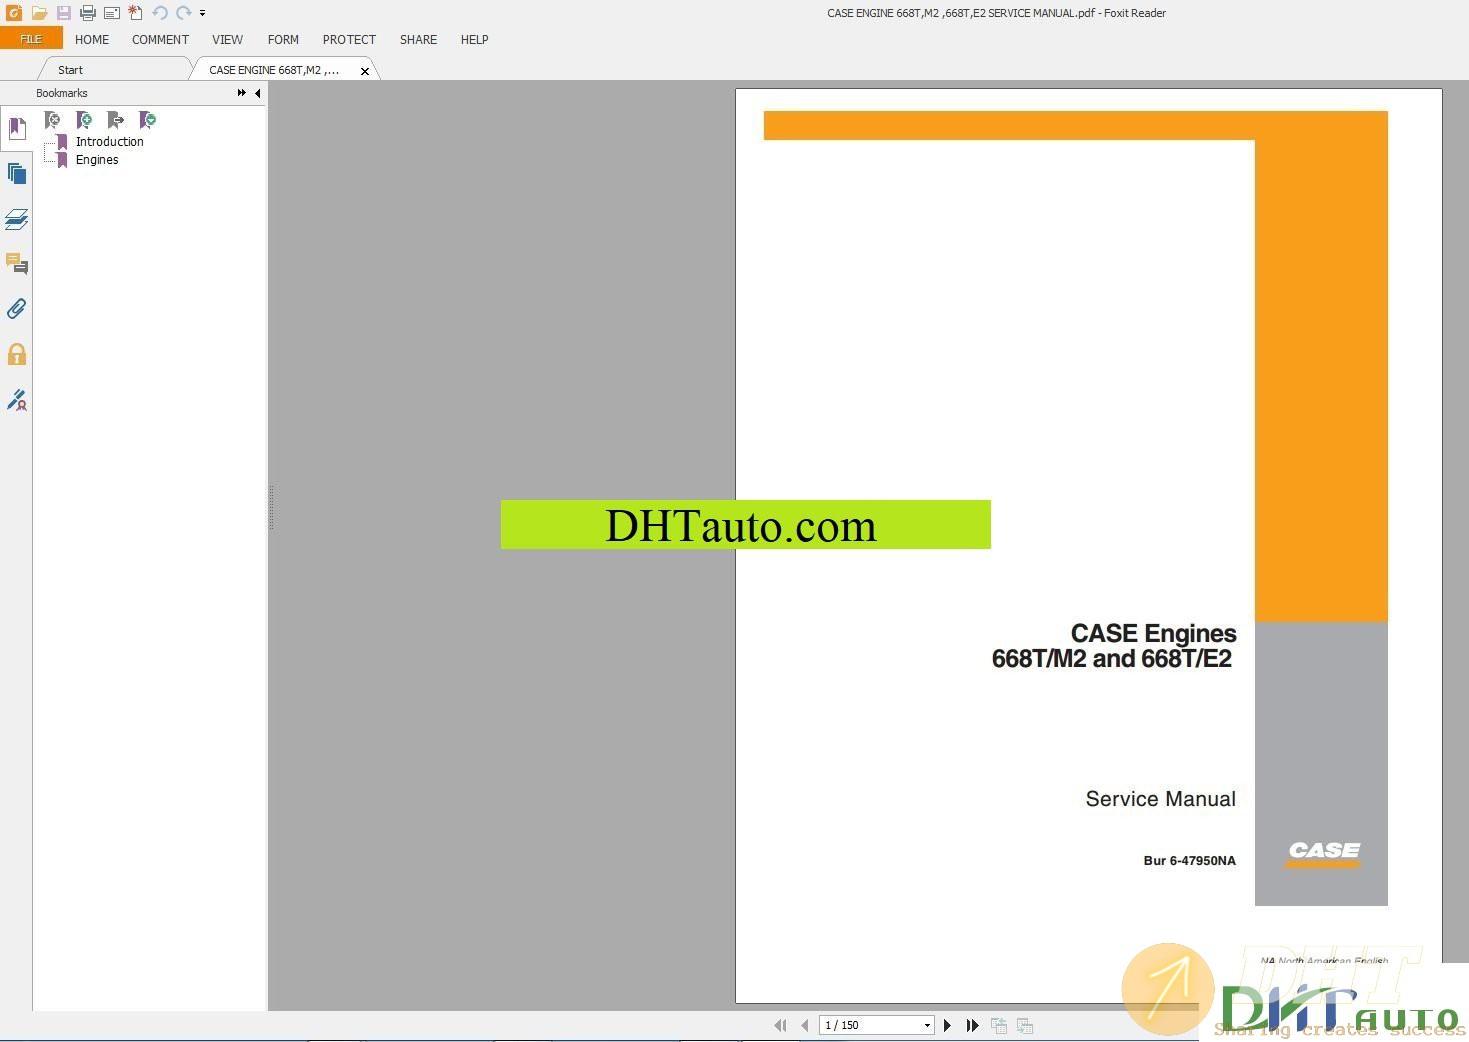 Case Engine Service Manual 7.jpg